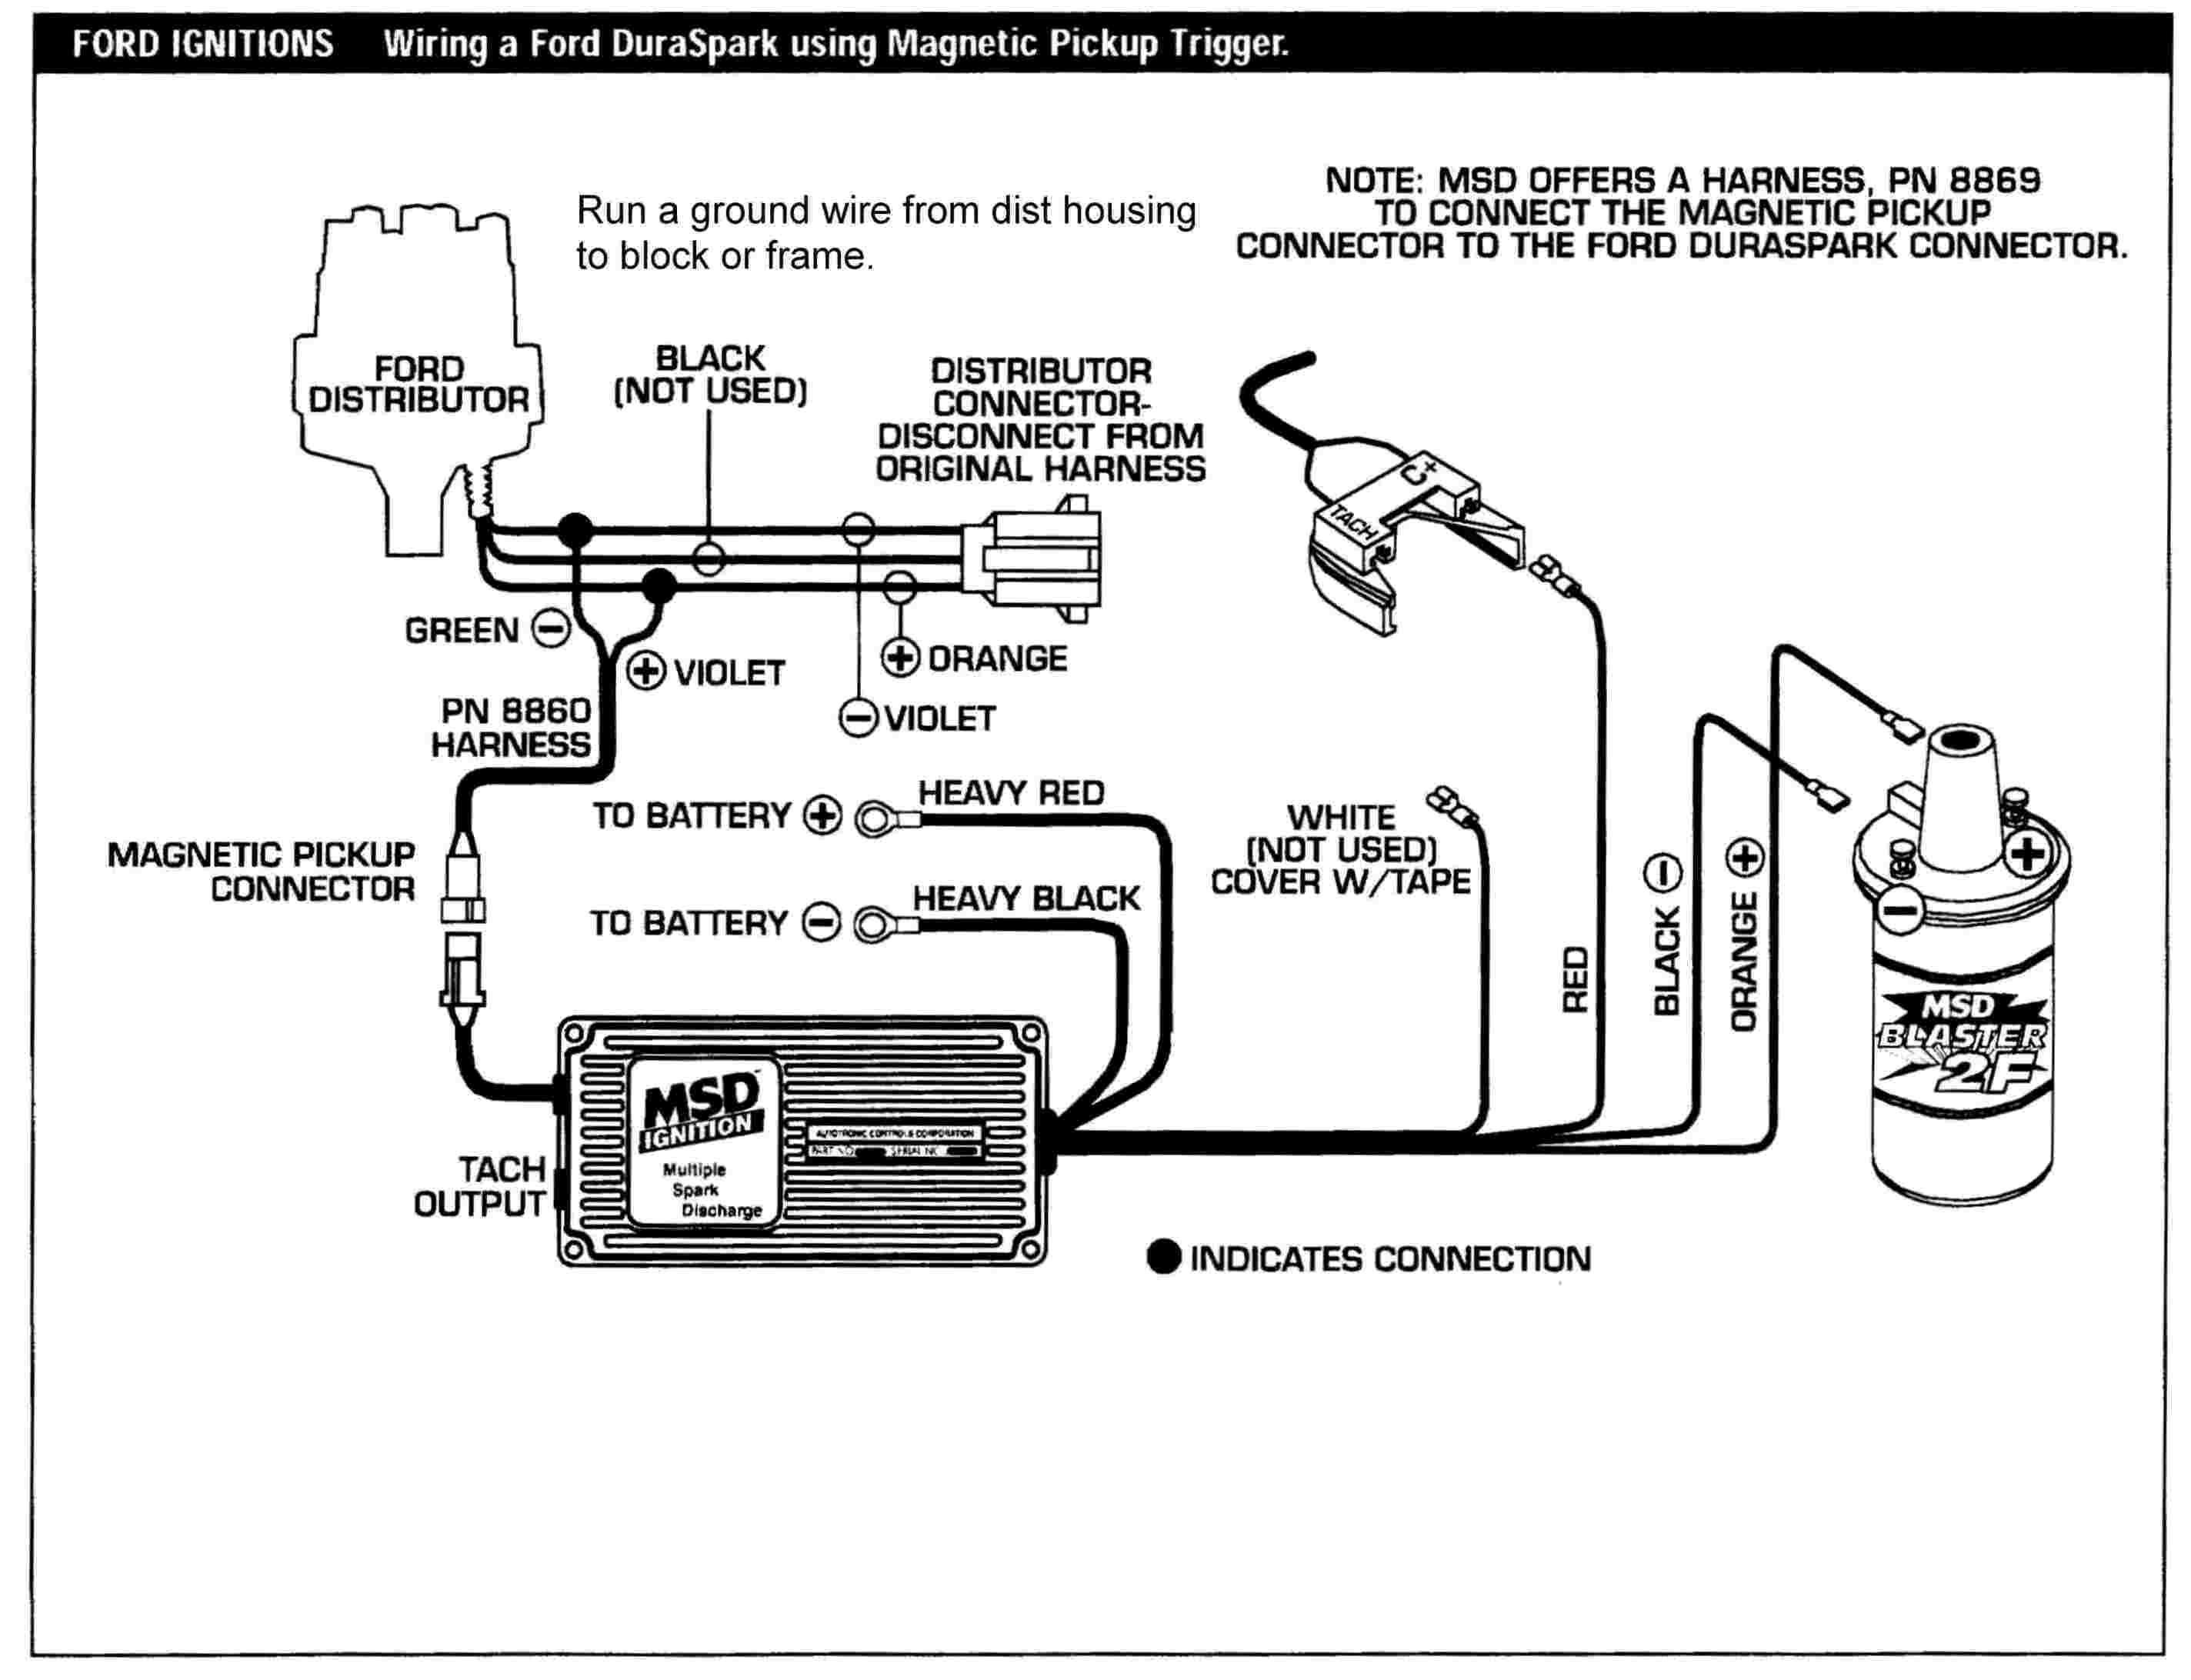 proform 390 distributor wiring diagram wiring diagramsproform 390 distributor wiring diagram saturn outlook engine msd 6a wiring diagram ford 302 wiring